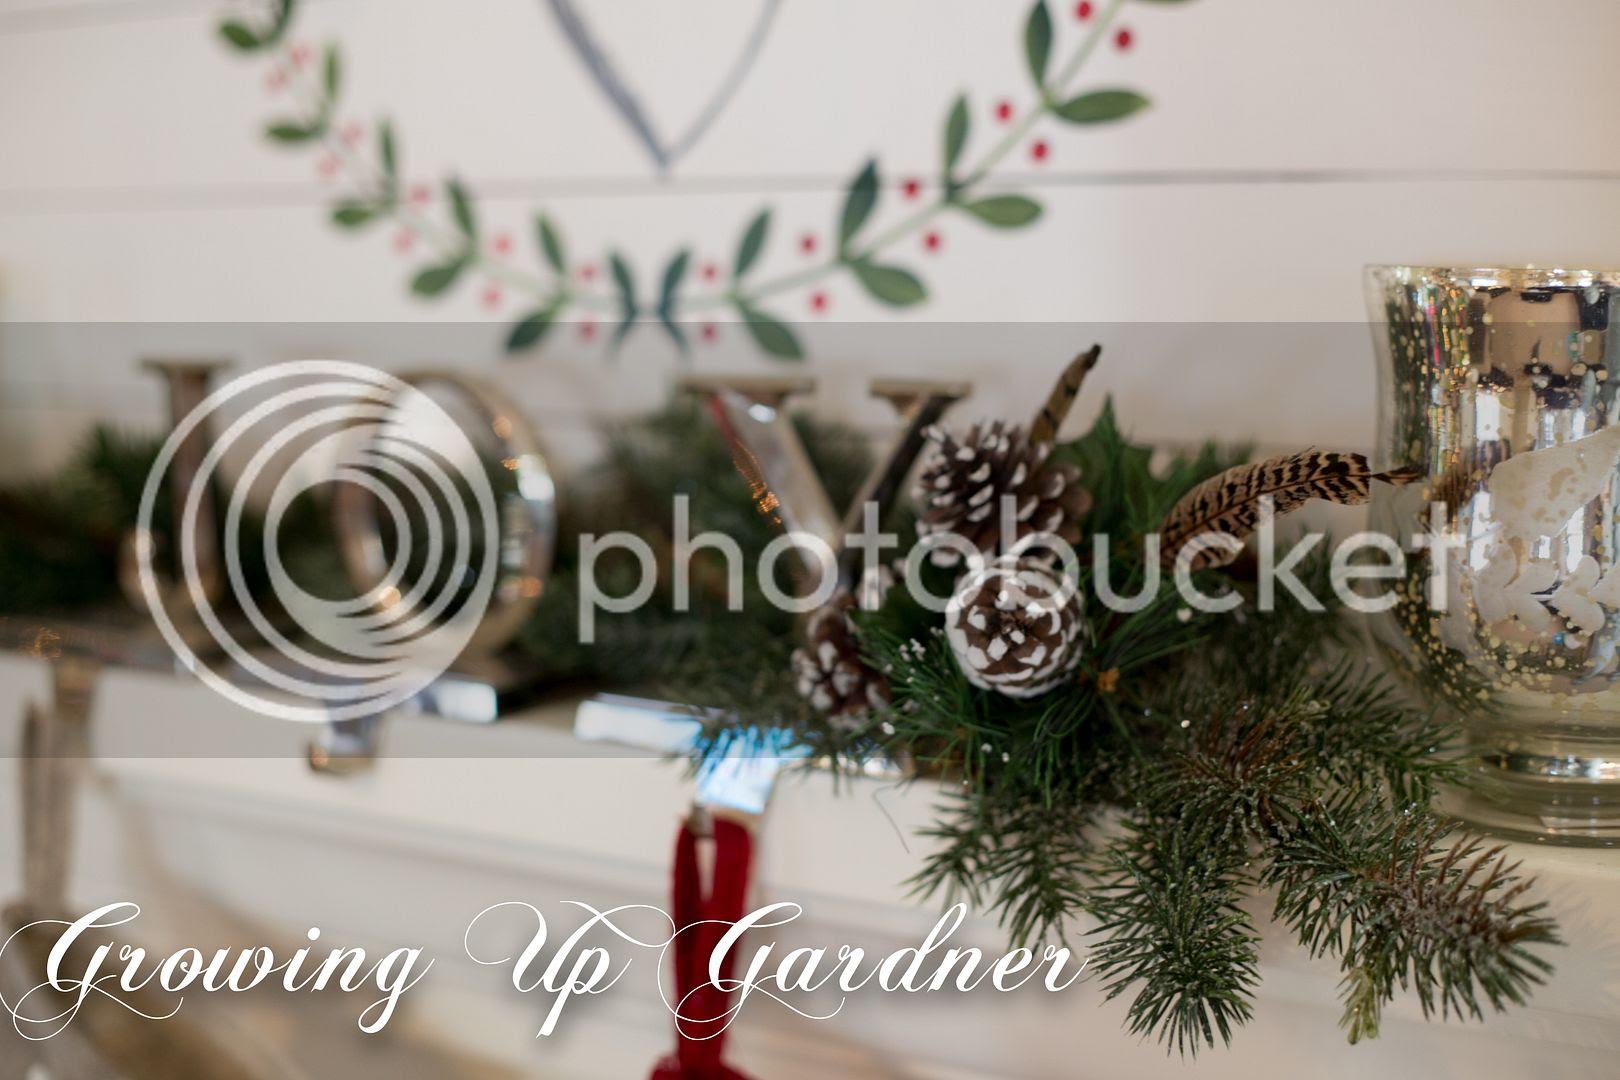 Christmas Mantle Decorations Growing Up Gardner photo christmasdecor14-2-1.jpg